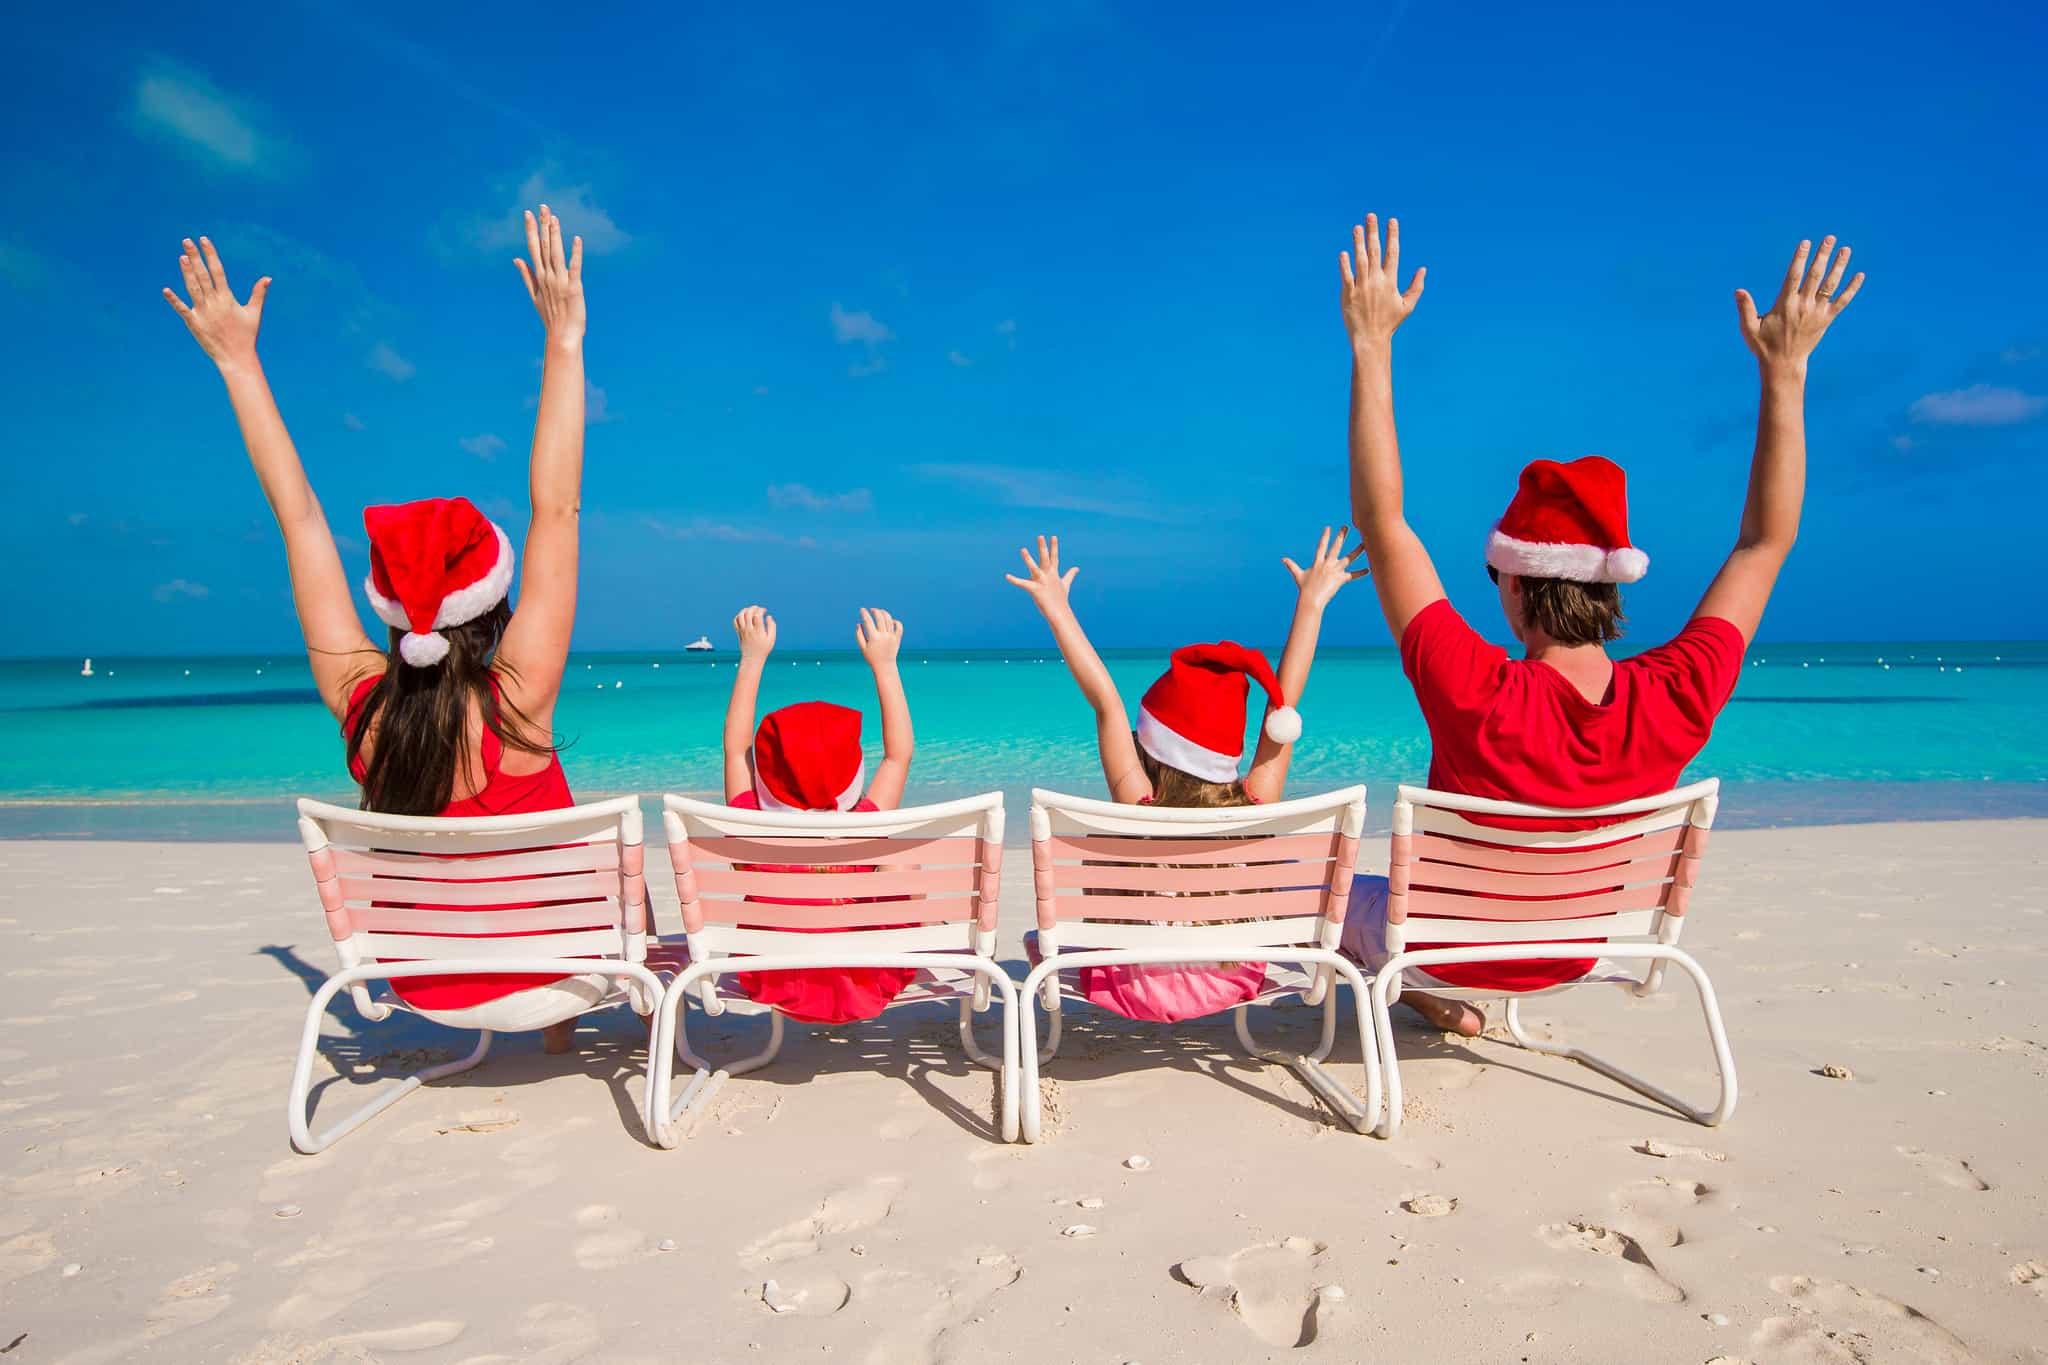 Family at the beach at Christmas